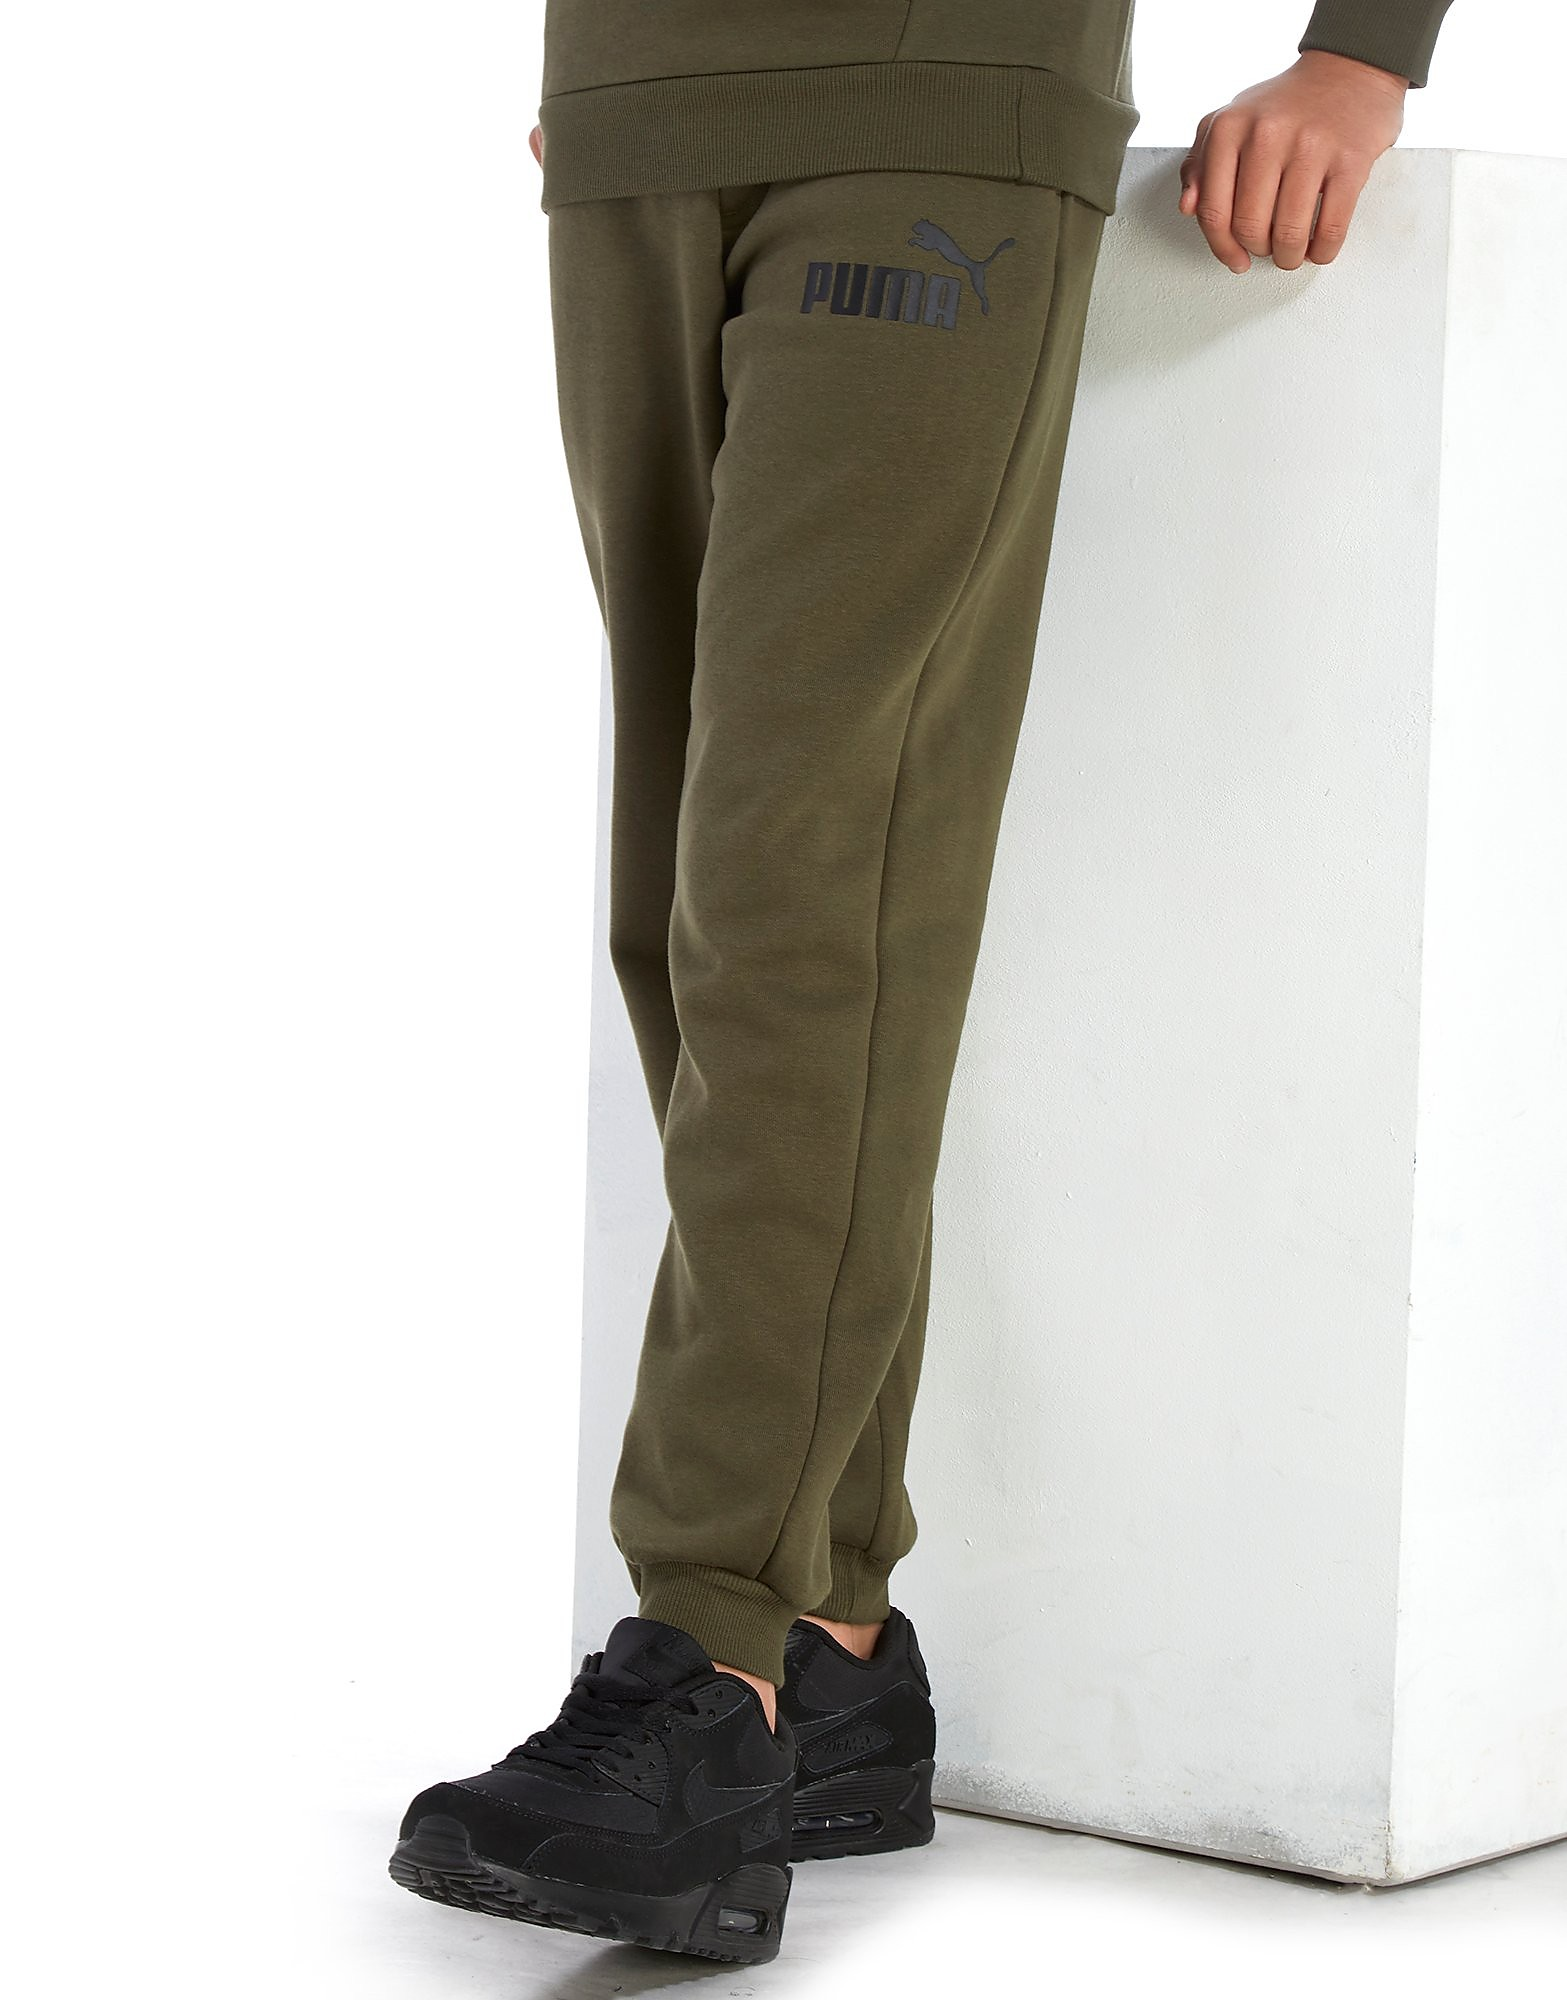 PUMA Core Logo Track Pants Junior - Olive/Black - Kind